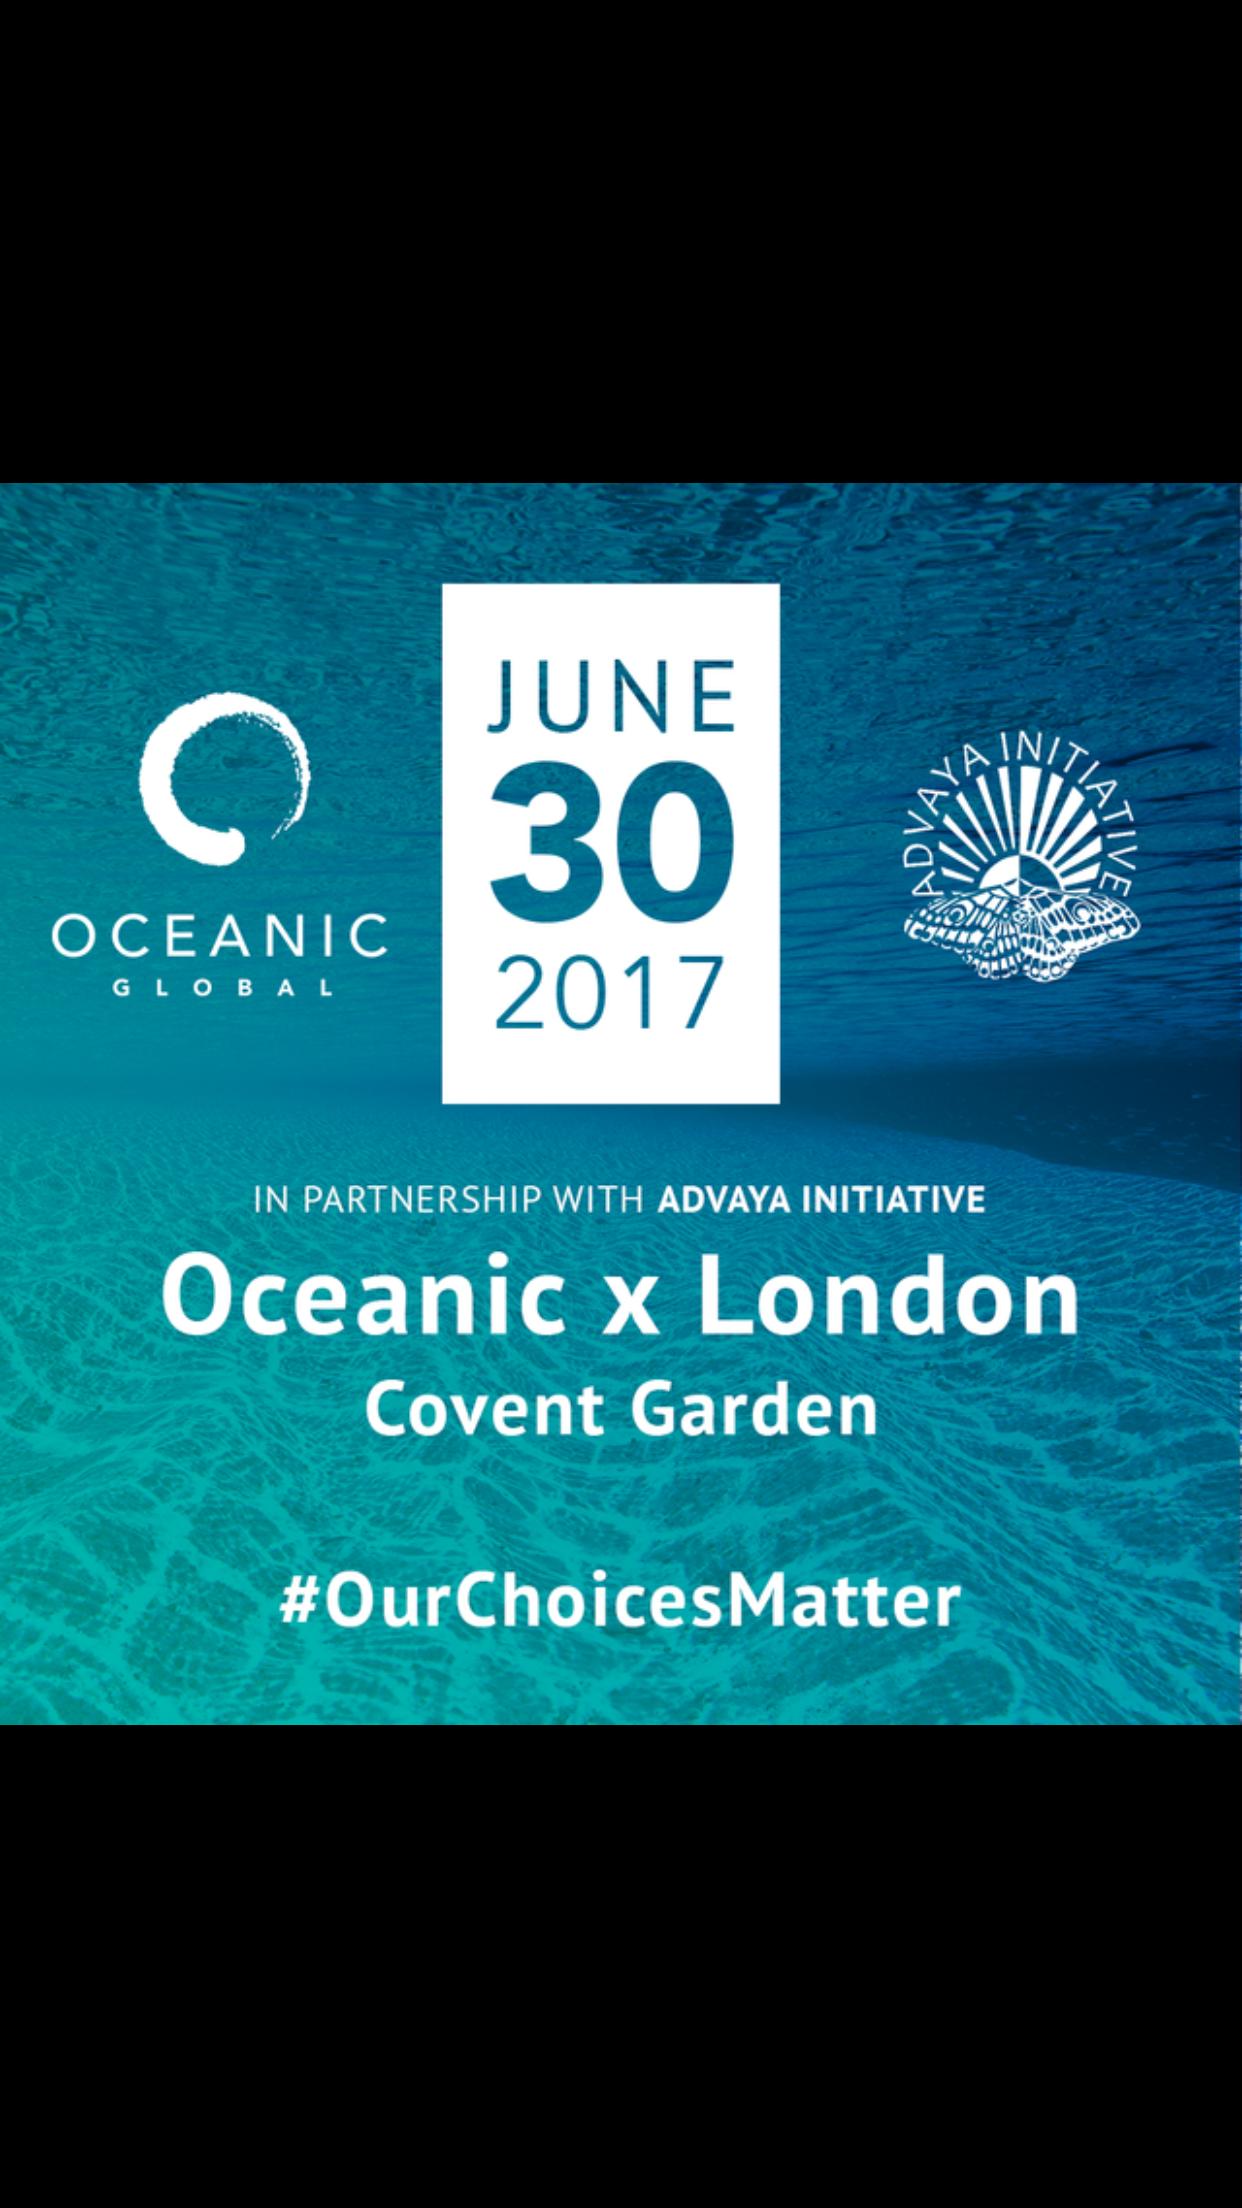 OCEANIC x LONDON with Advaya Initiative